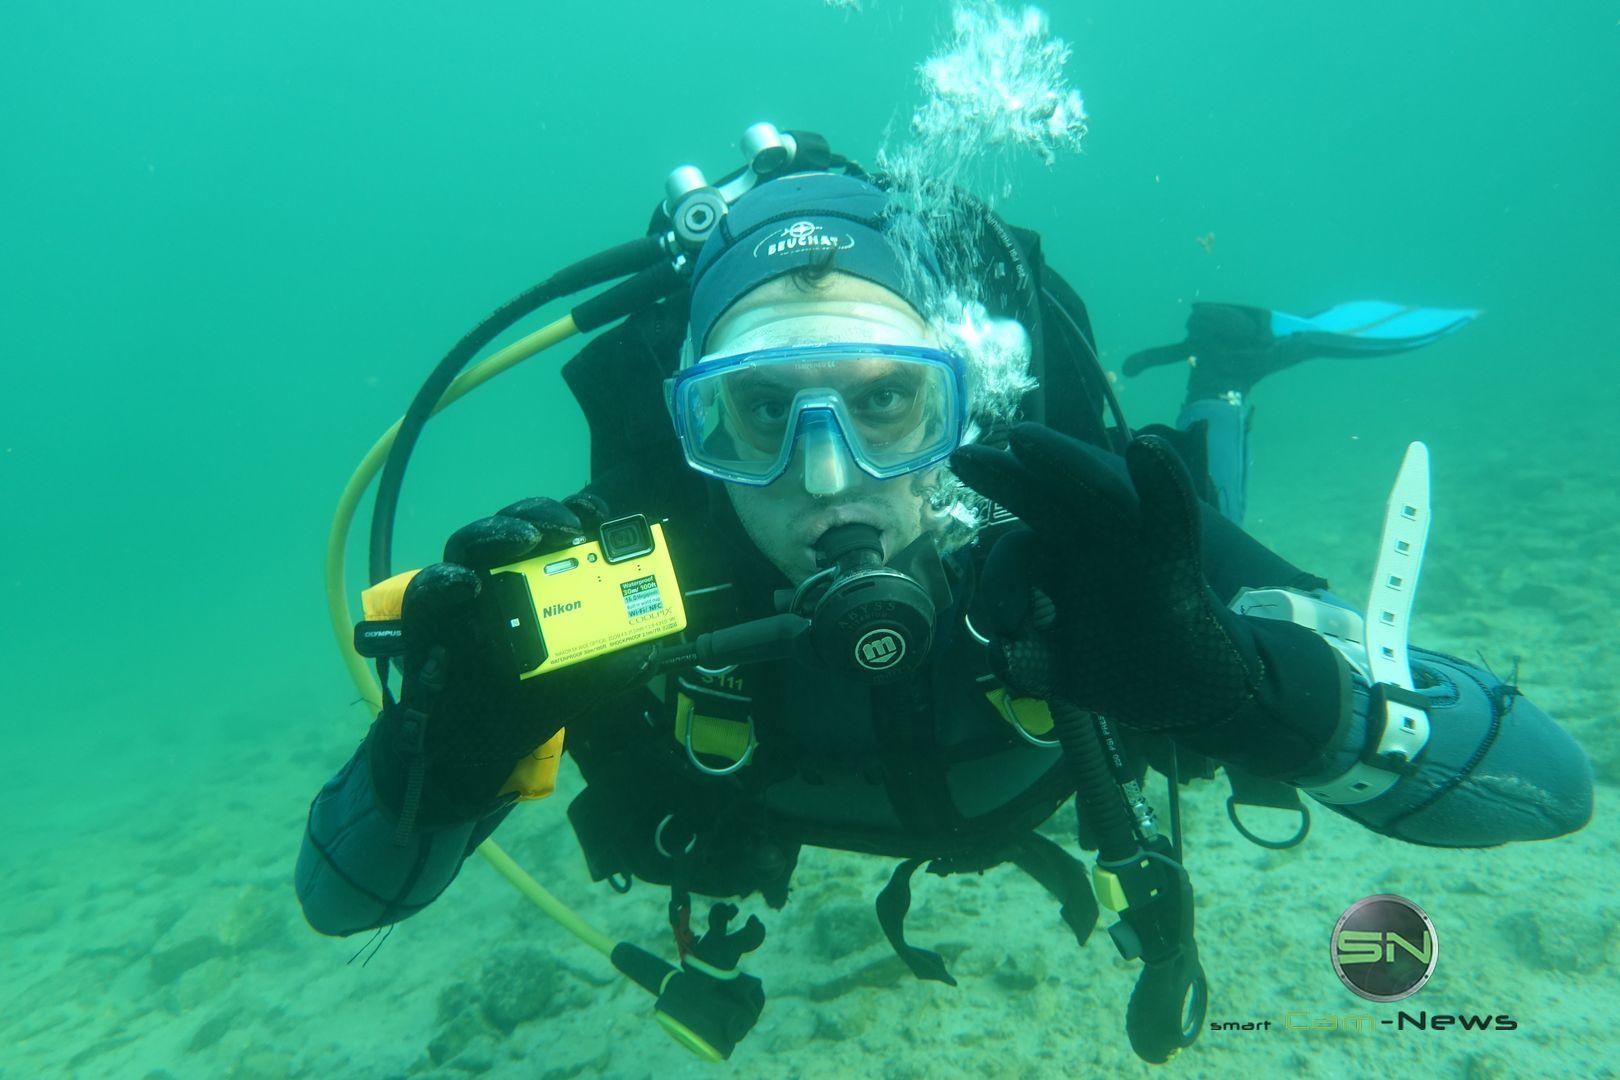 Nikon-AW130-Diving-Test-Achensee-Tirol-SmartCamNews